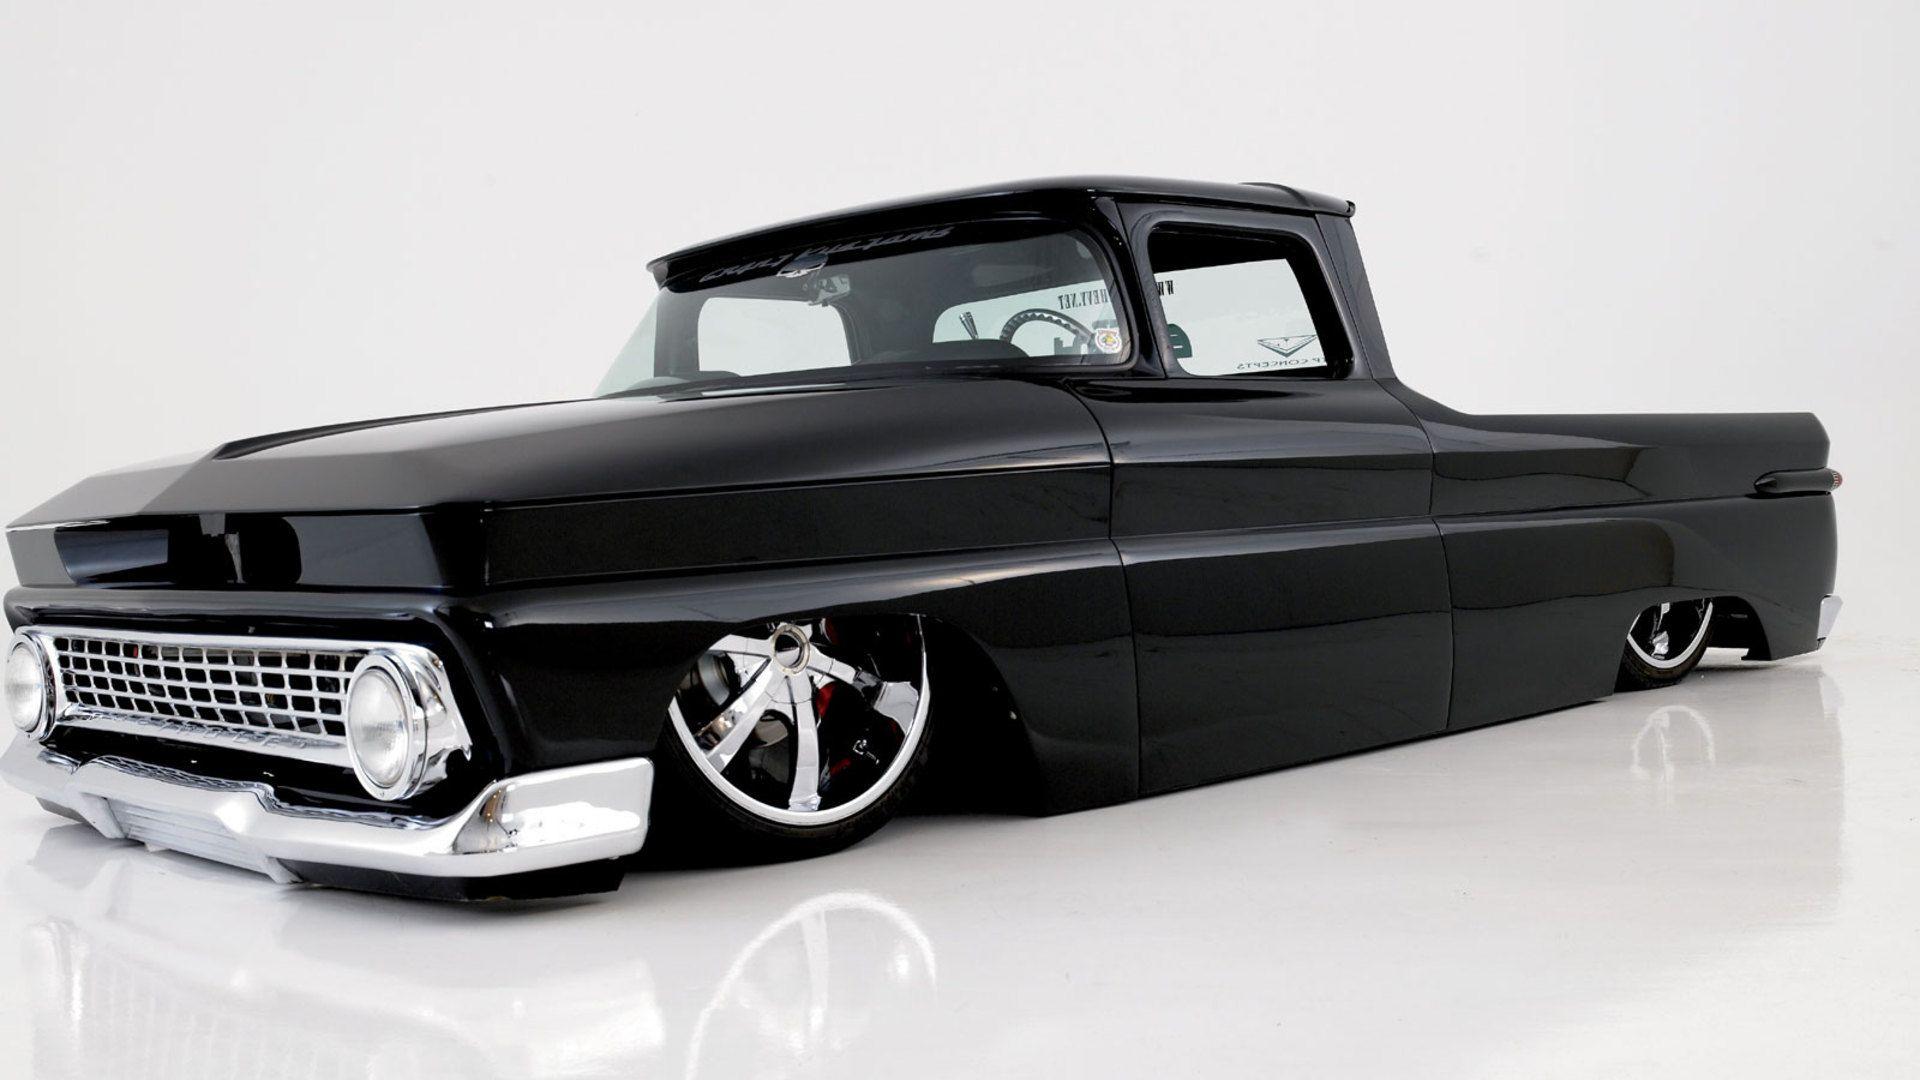 119 Lowrider Wallpapers Lowrider Backgrounds Chevy Trucks Cars Trucks Custom Trucks